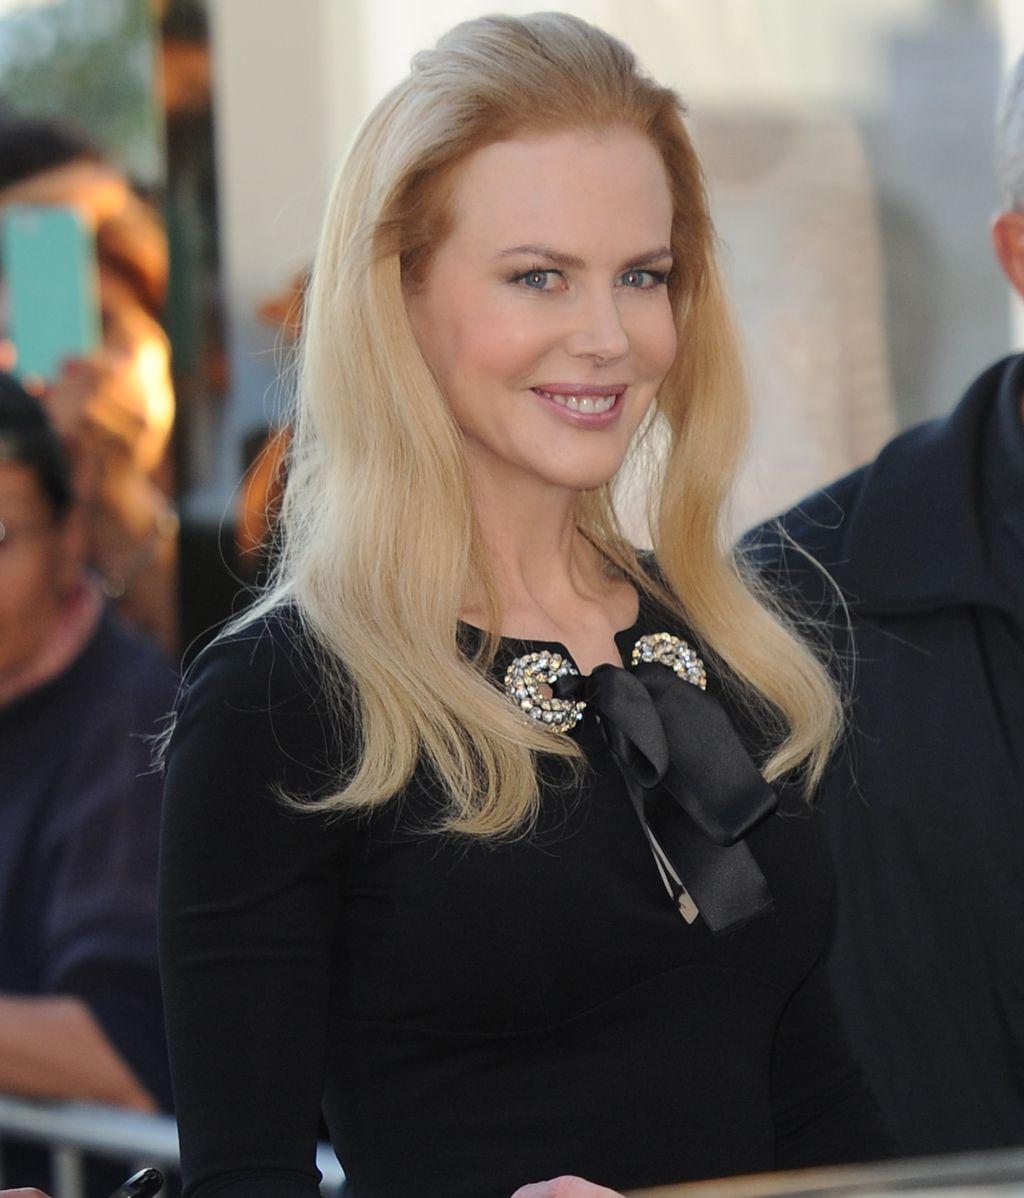 La actriz Nicole Kidman en Cannes